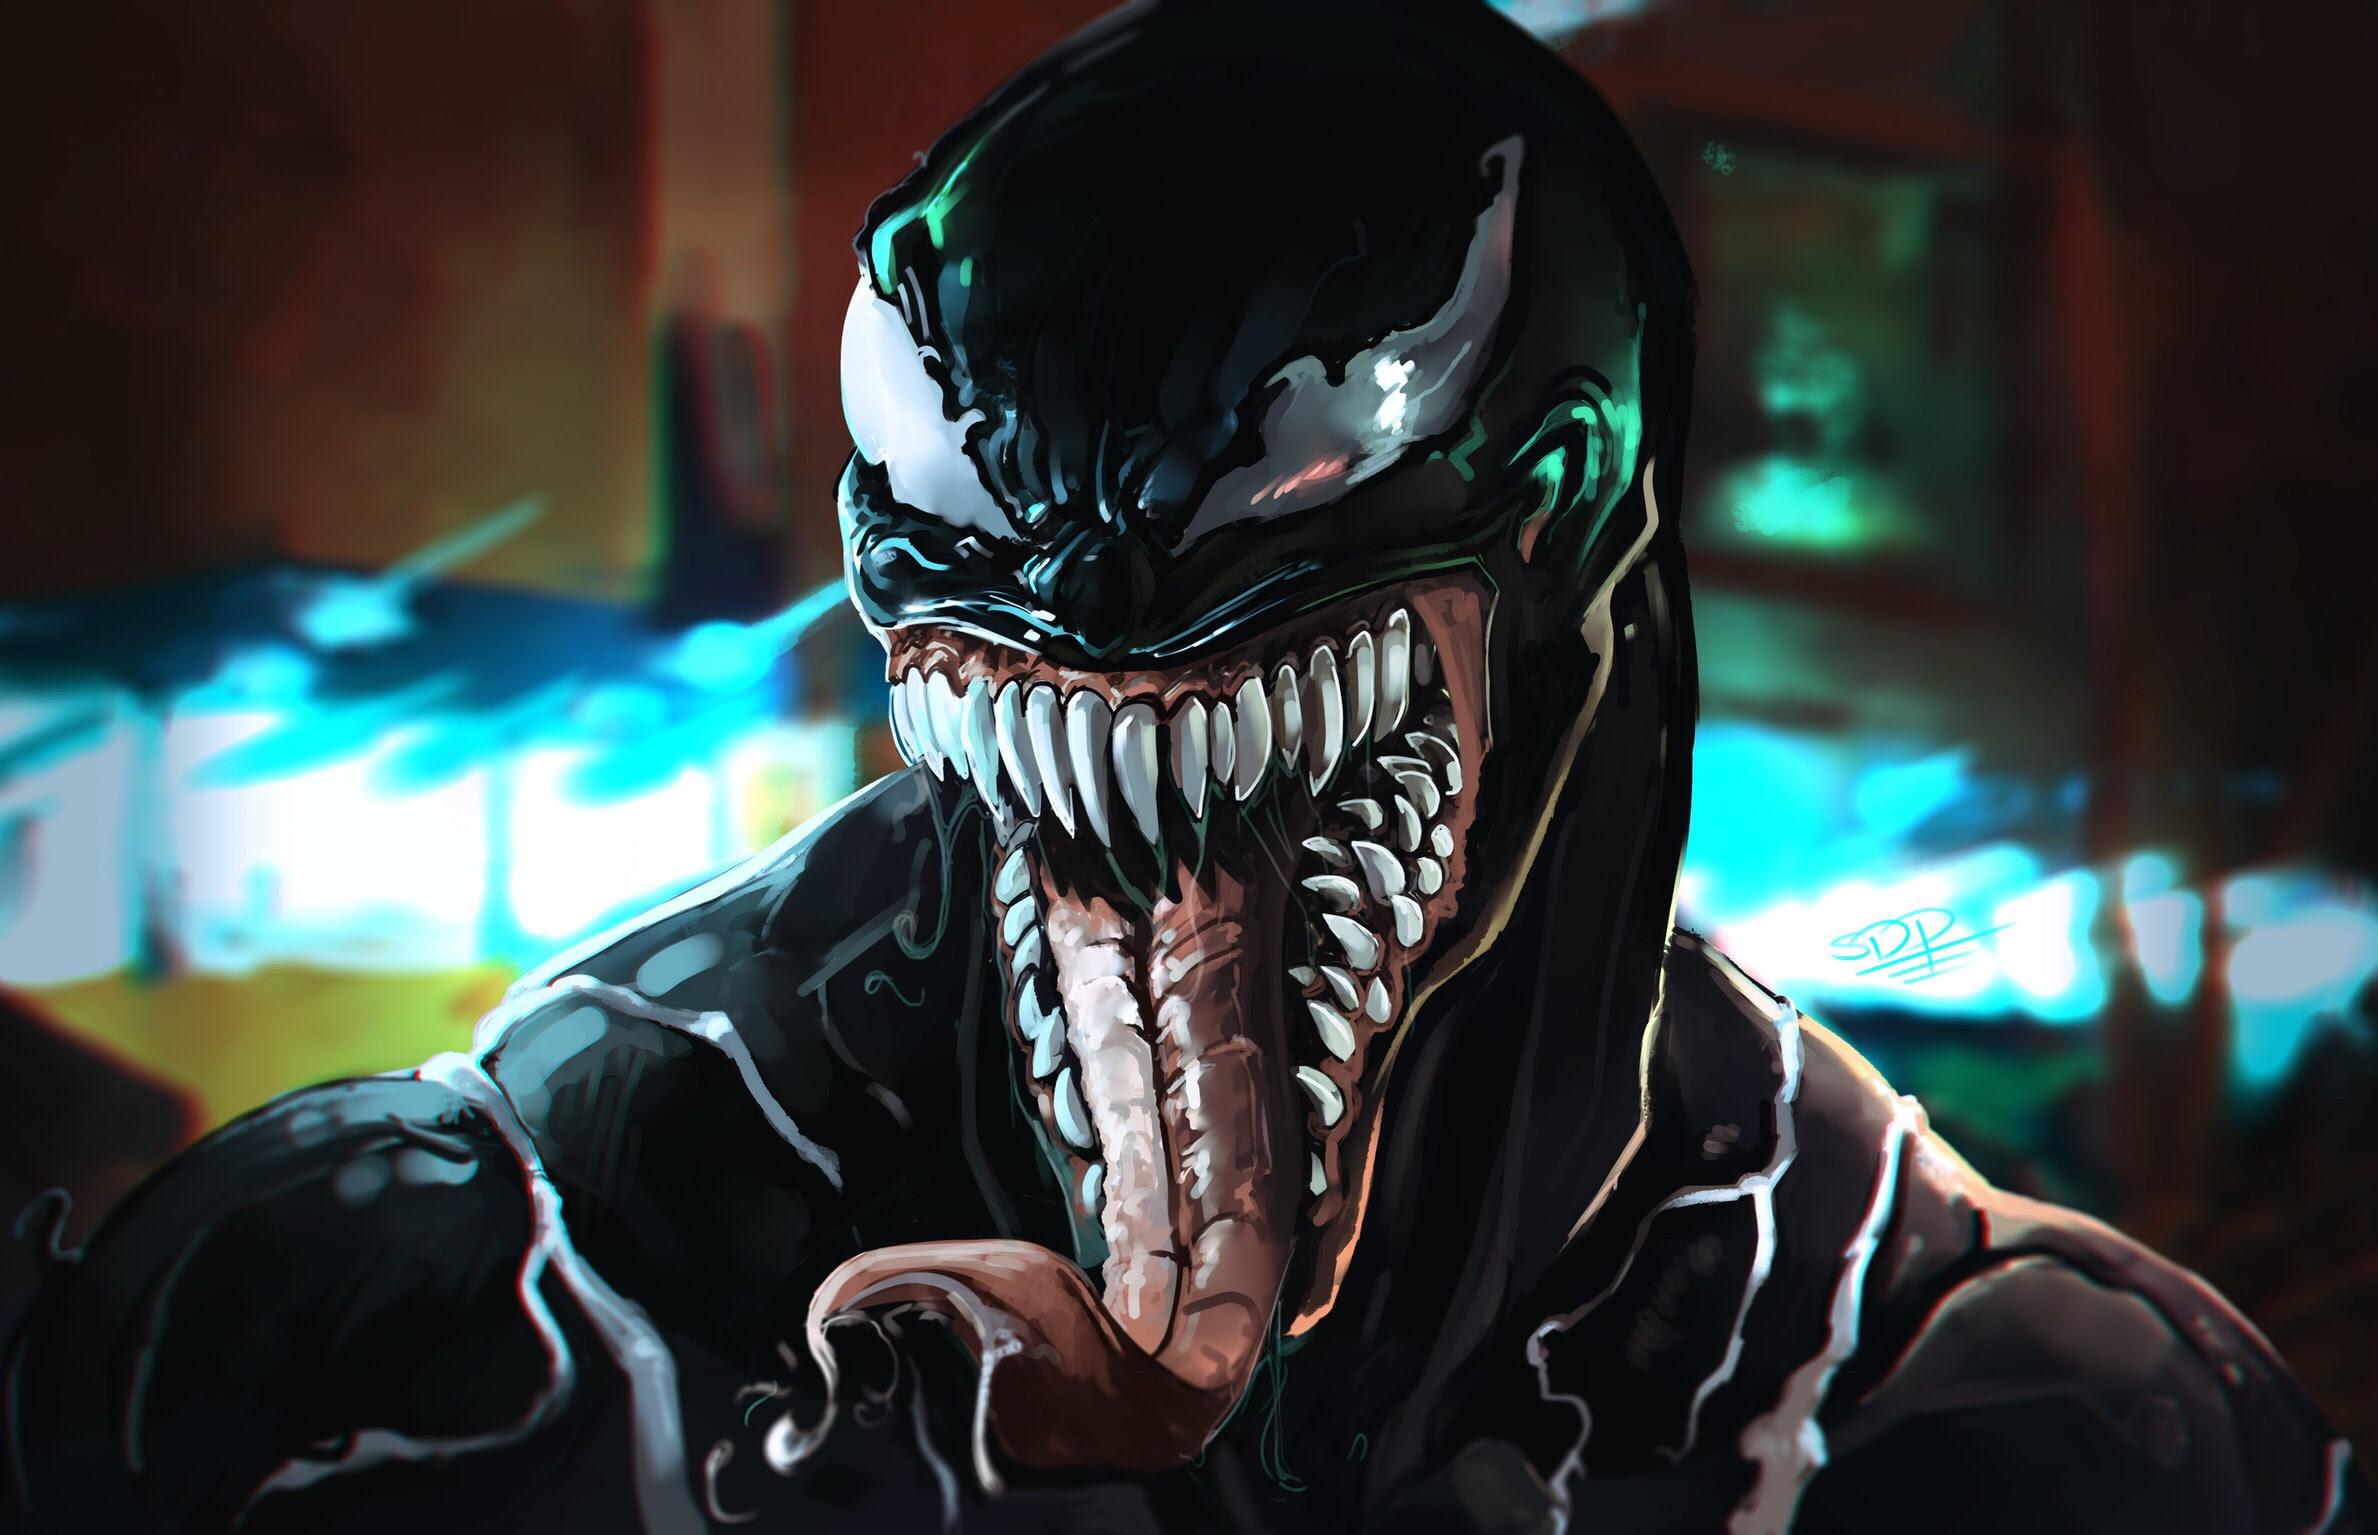 Venom Movie Art, HD Movies, 4k Wallpapers, Images ...